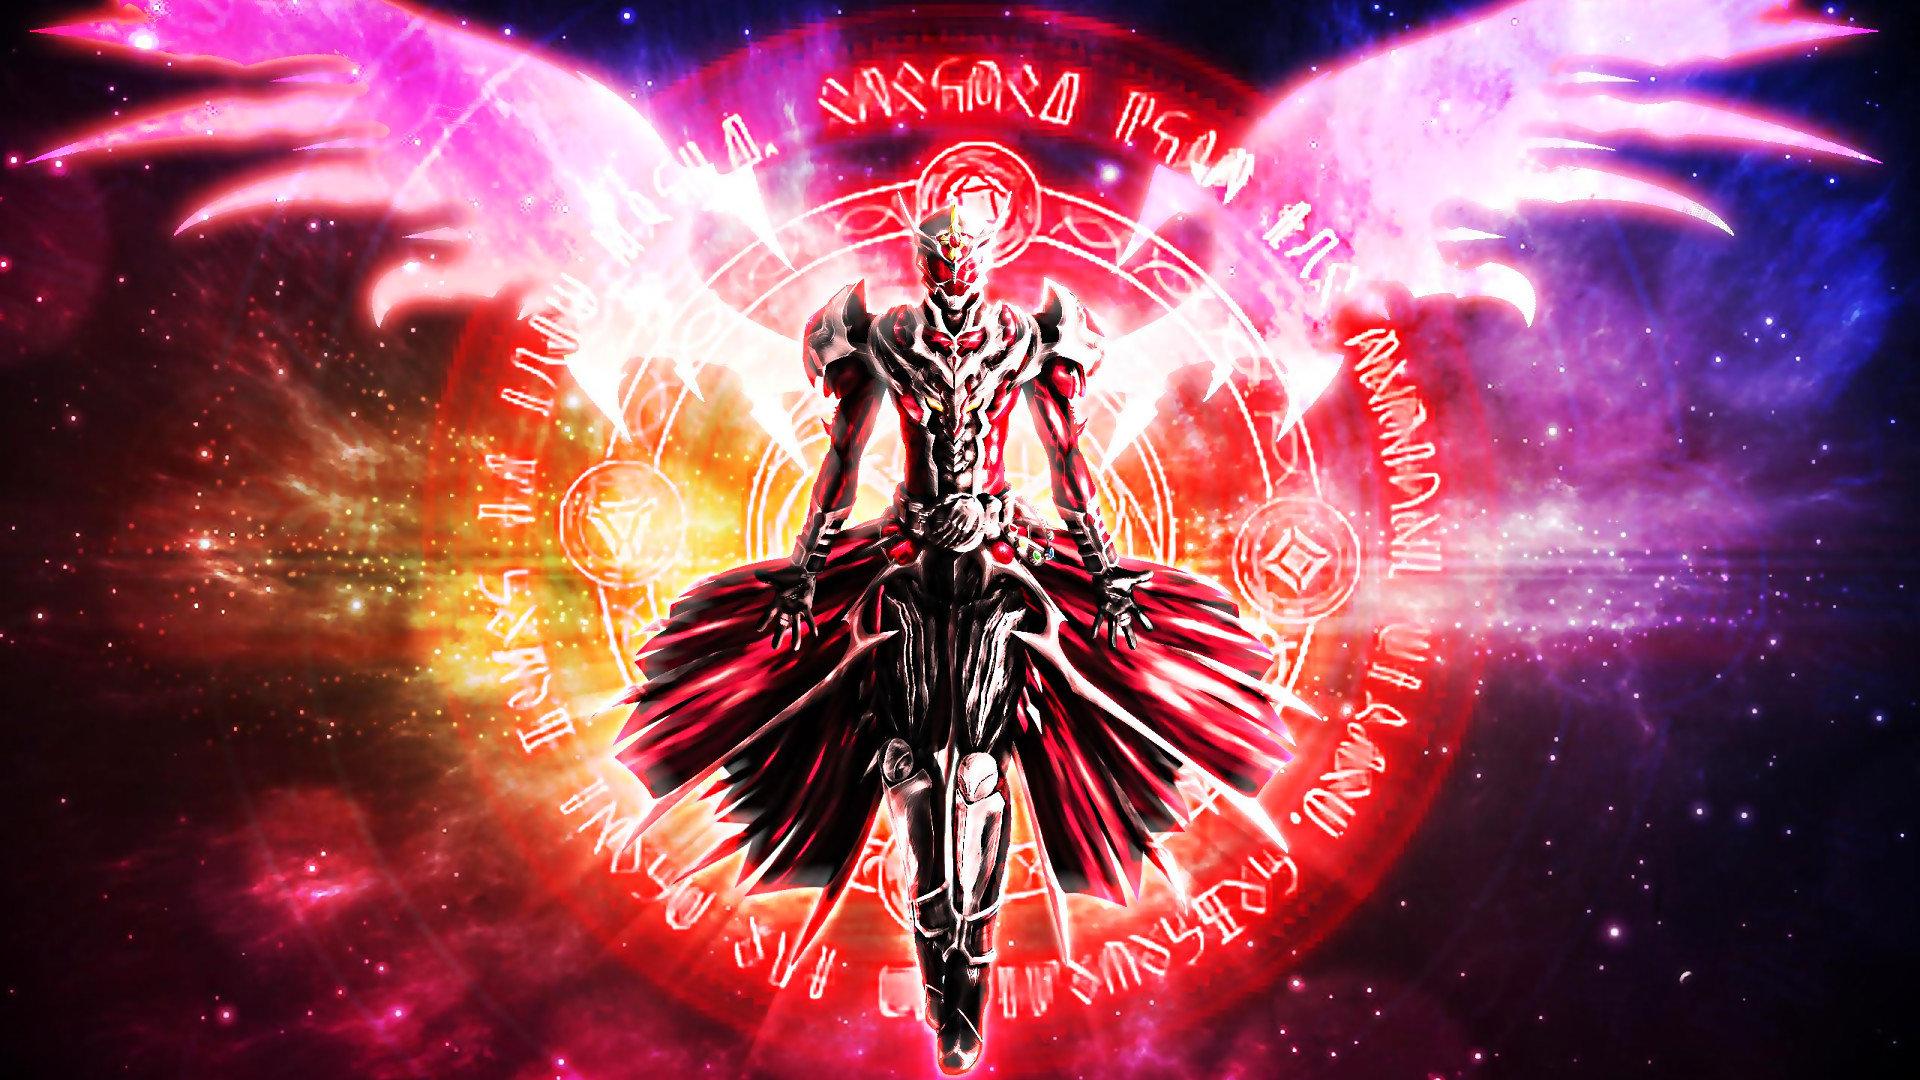 Kamen Rider Wallpapers Hd For Desktop Backgrounds